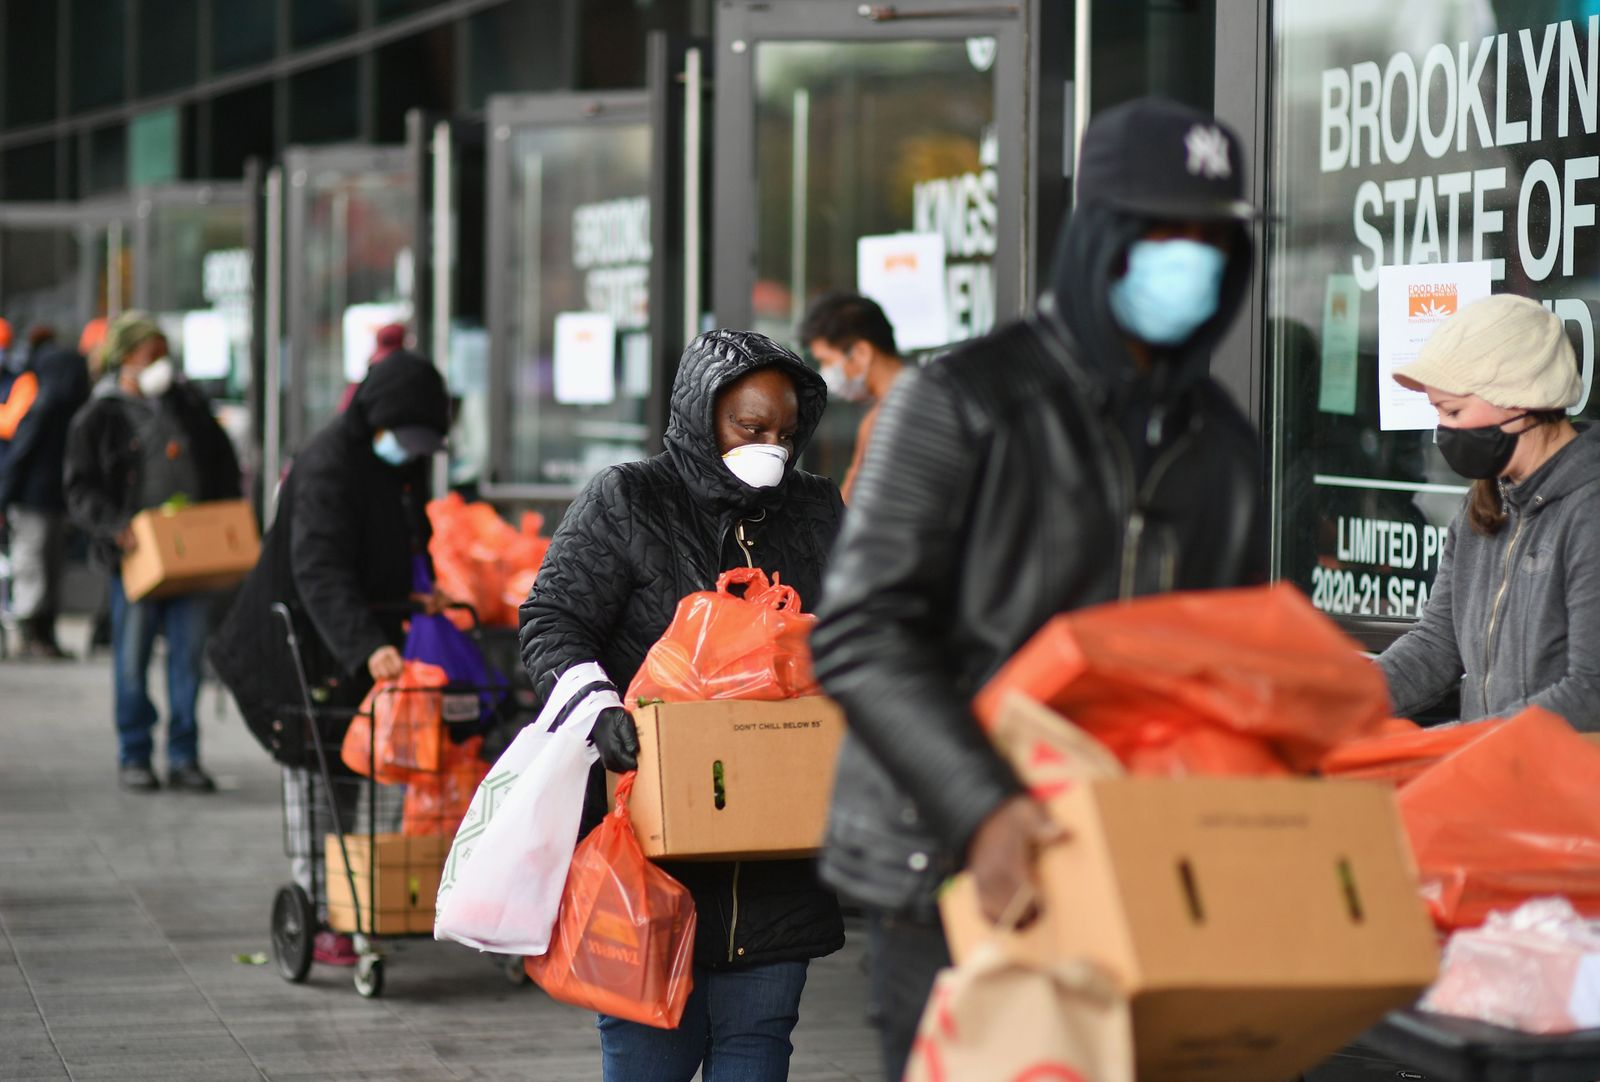 Coronavirus Pandemic Causes Climate Of Anxiety